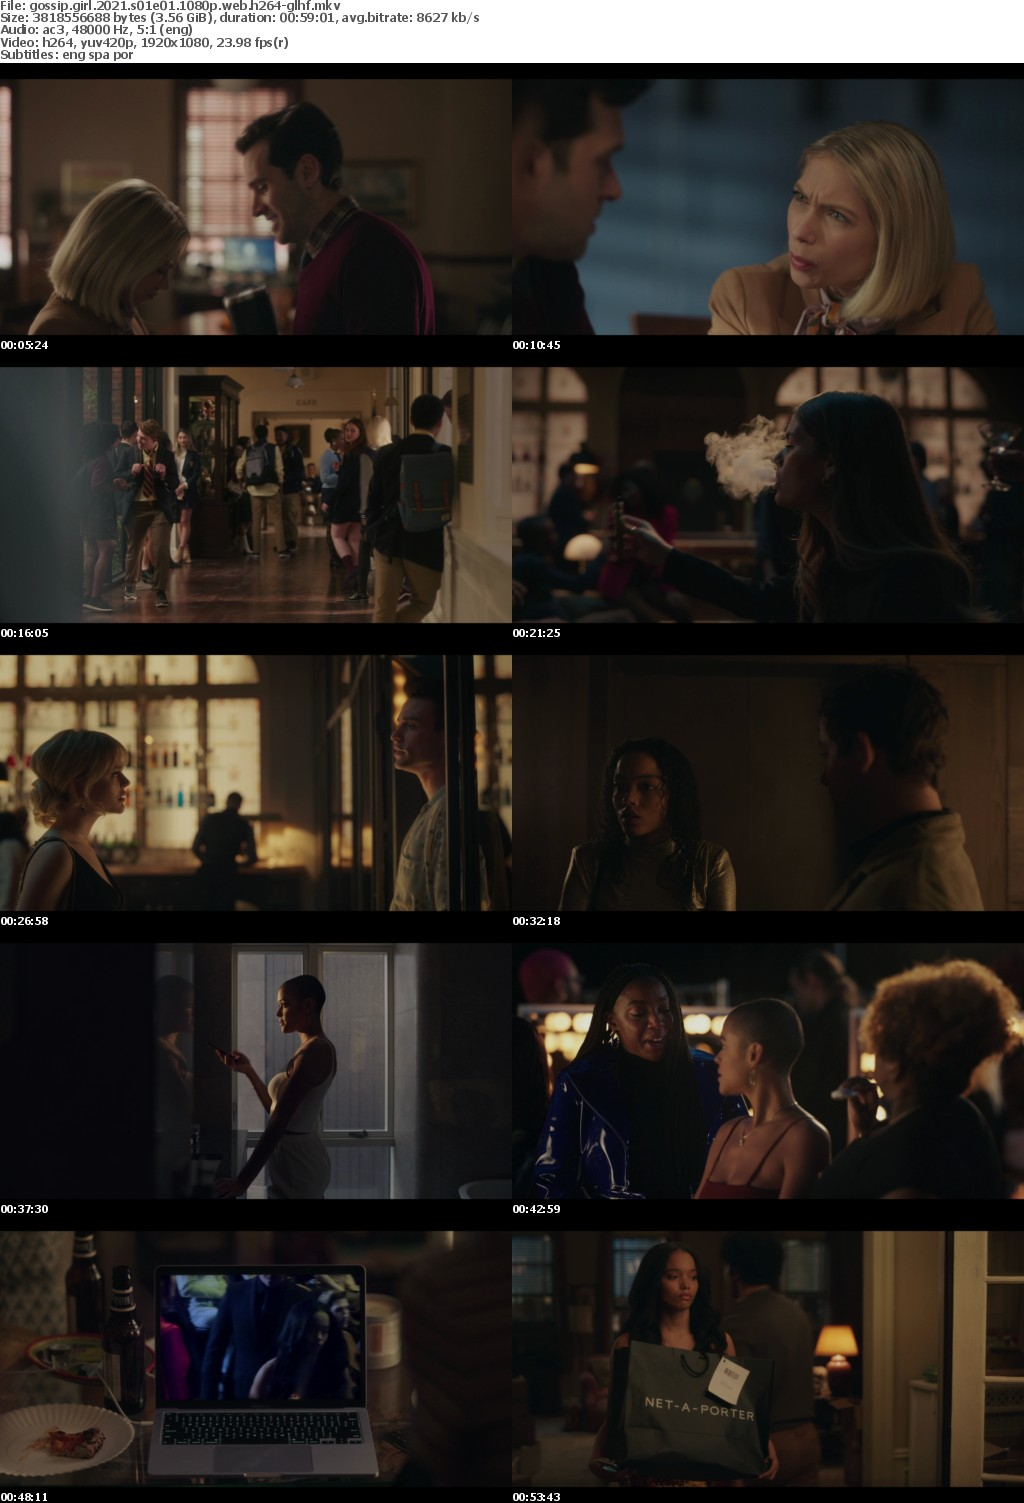 Gossip Girl 2021 S01E01 1080p WEB H264-GLHF